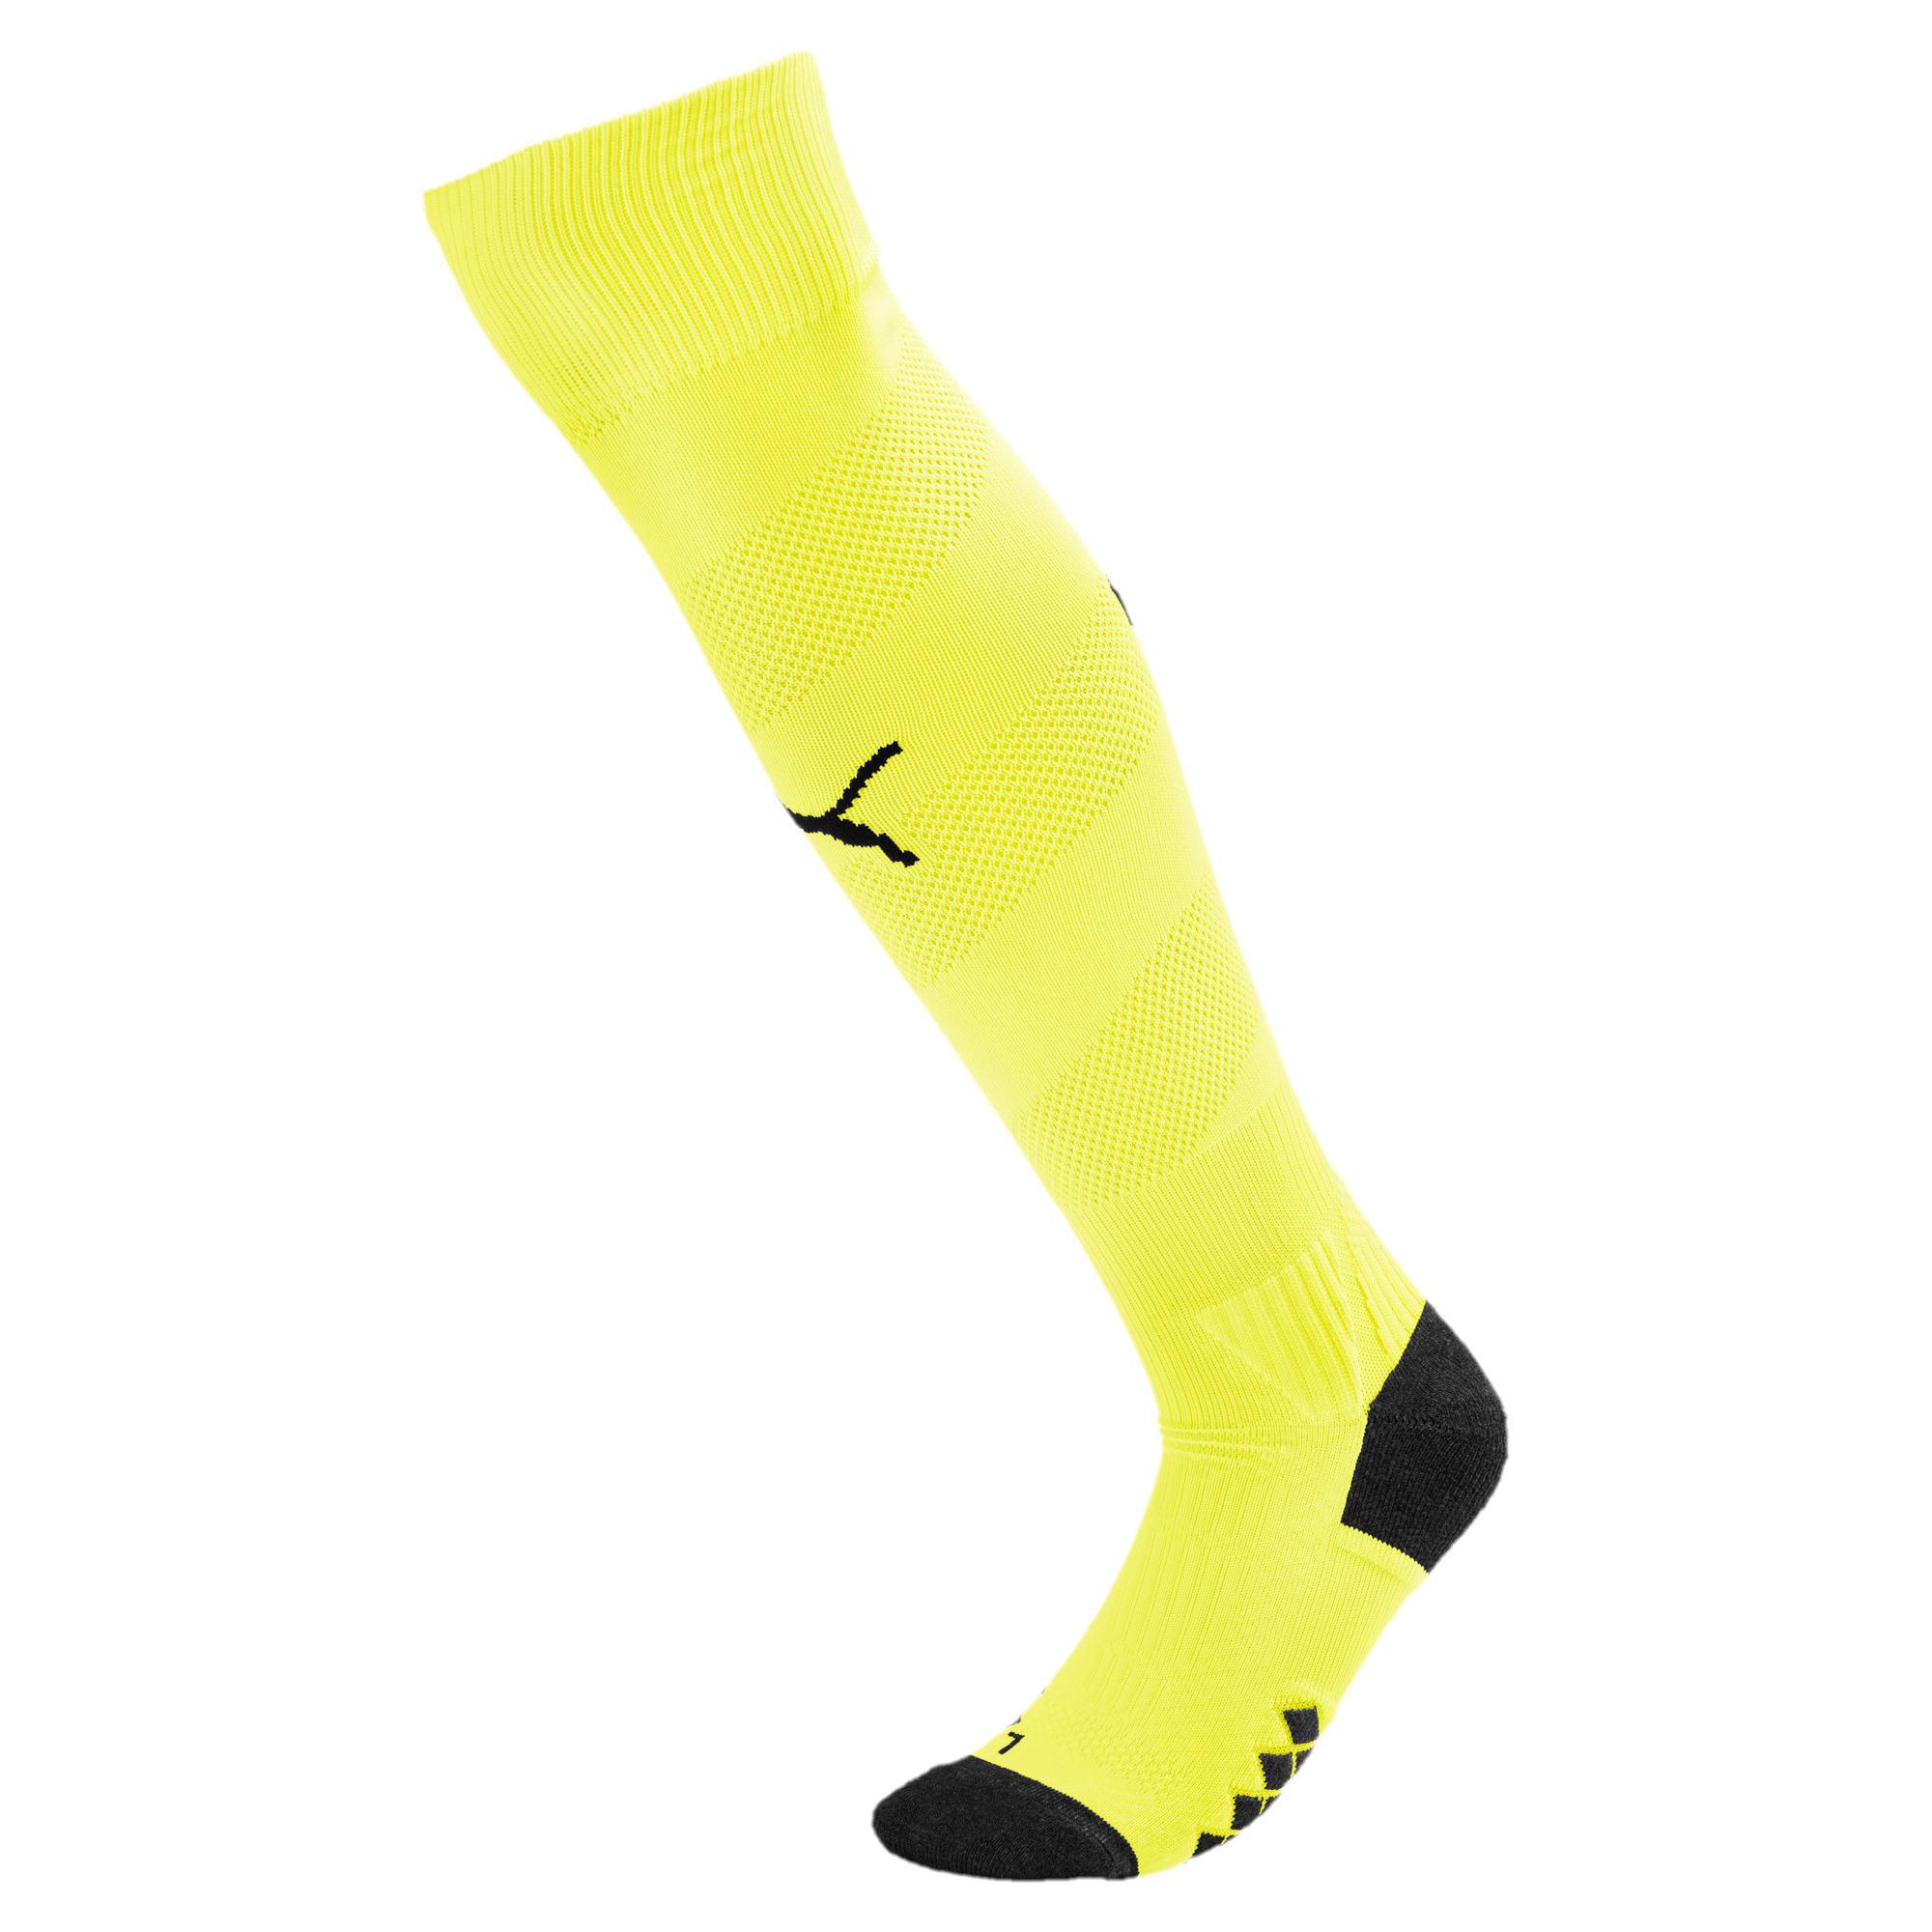 Thumbnail 1 of Man City Spiral Men's Socks, Fizzy Yellow-Puma Black, medium